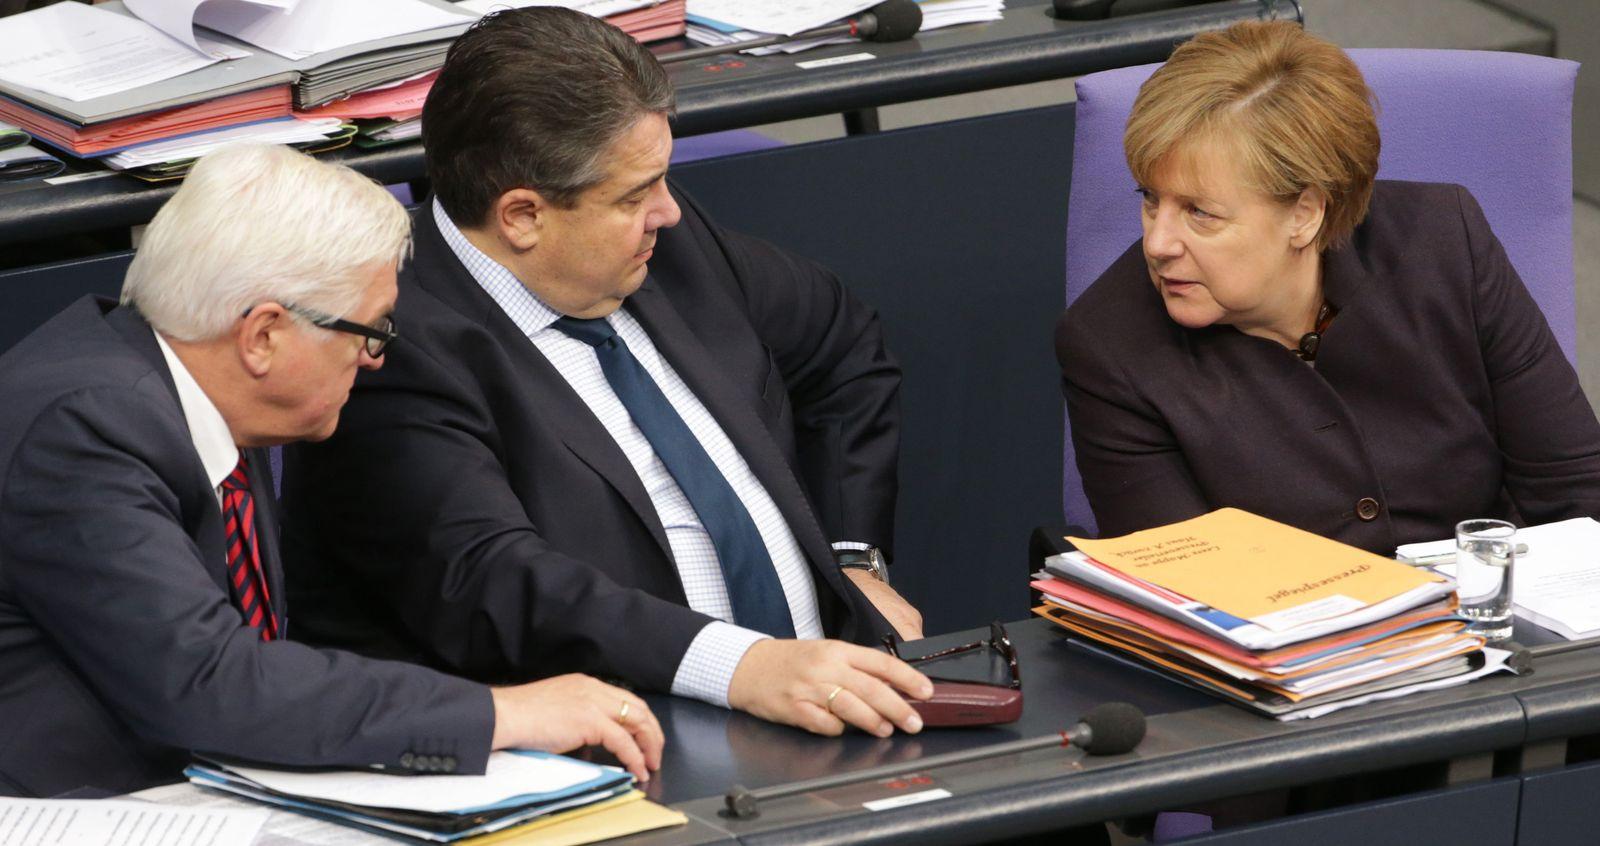 Merkel Gabriel Bundestag Haushaltsdebatte